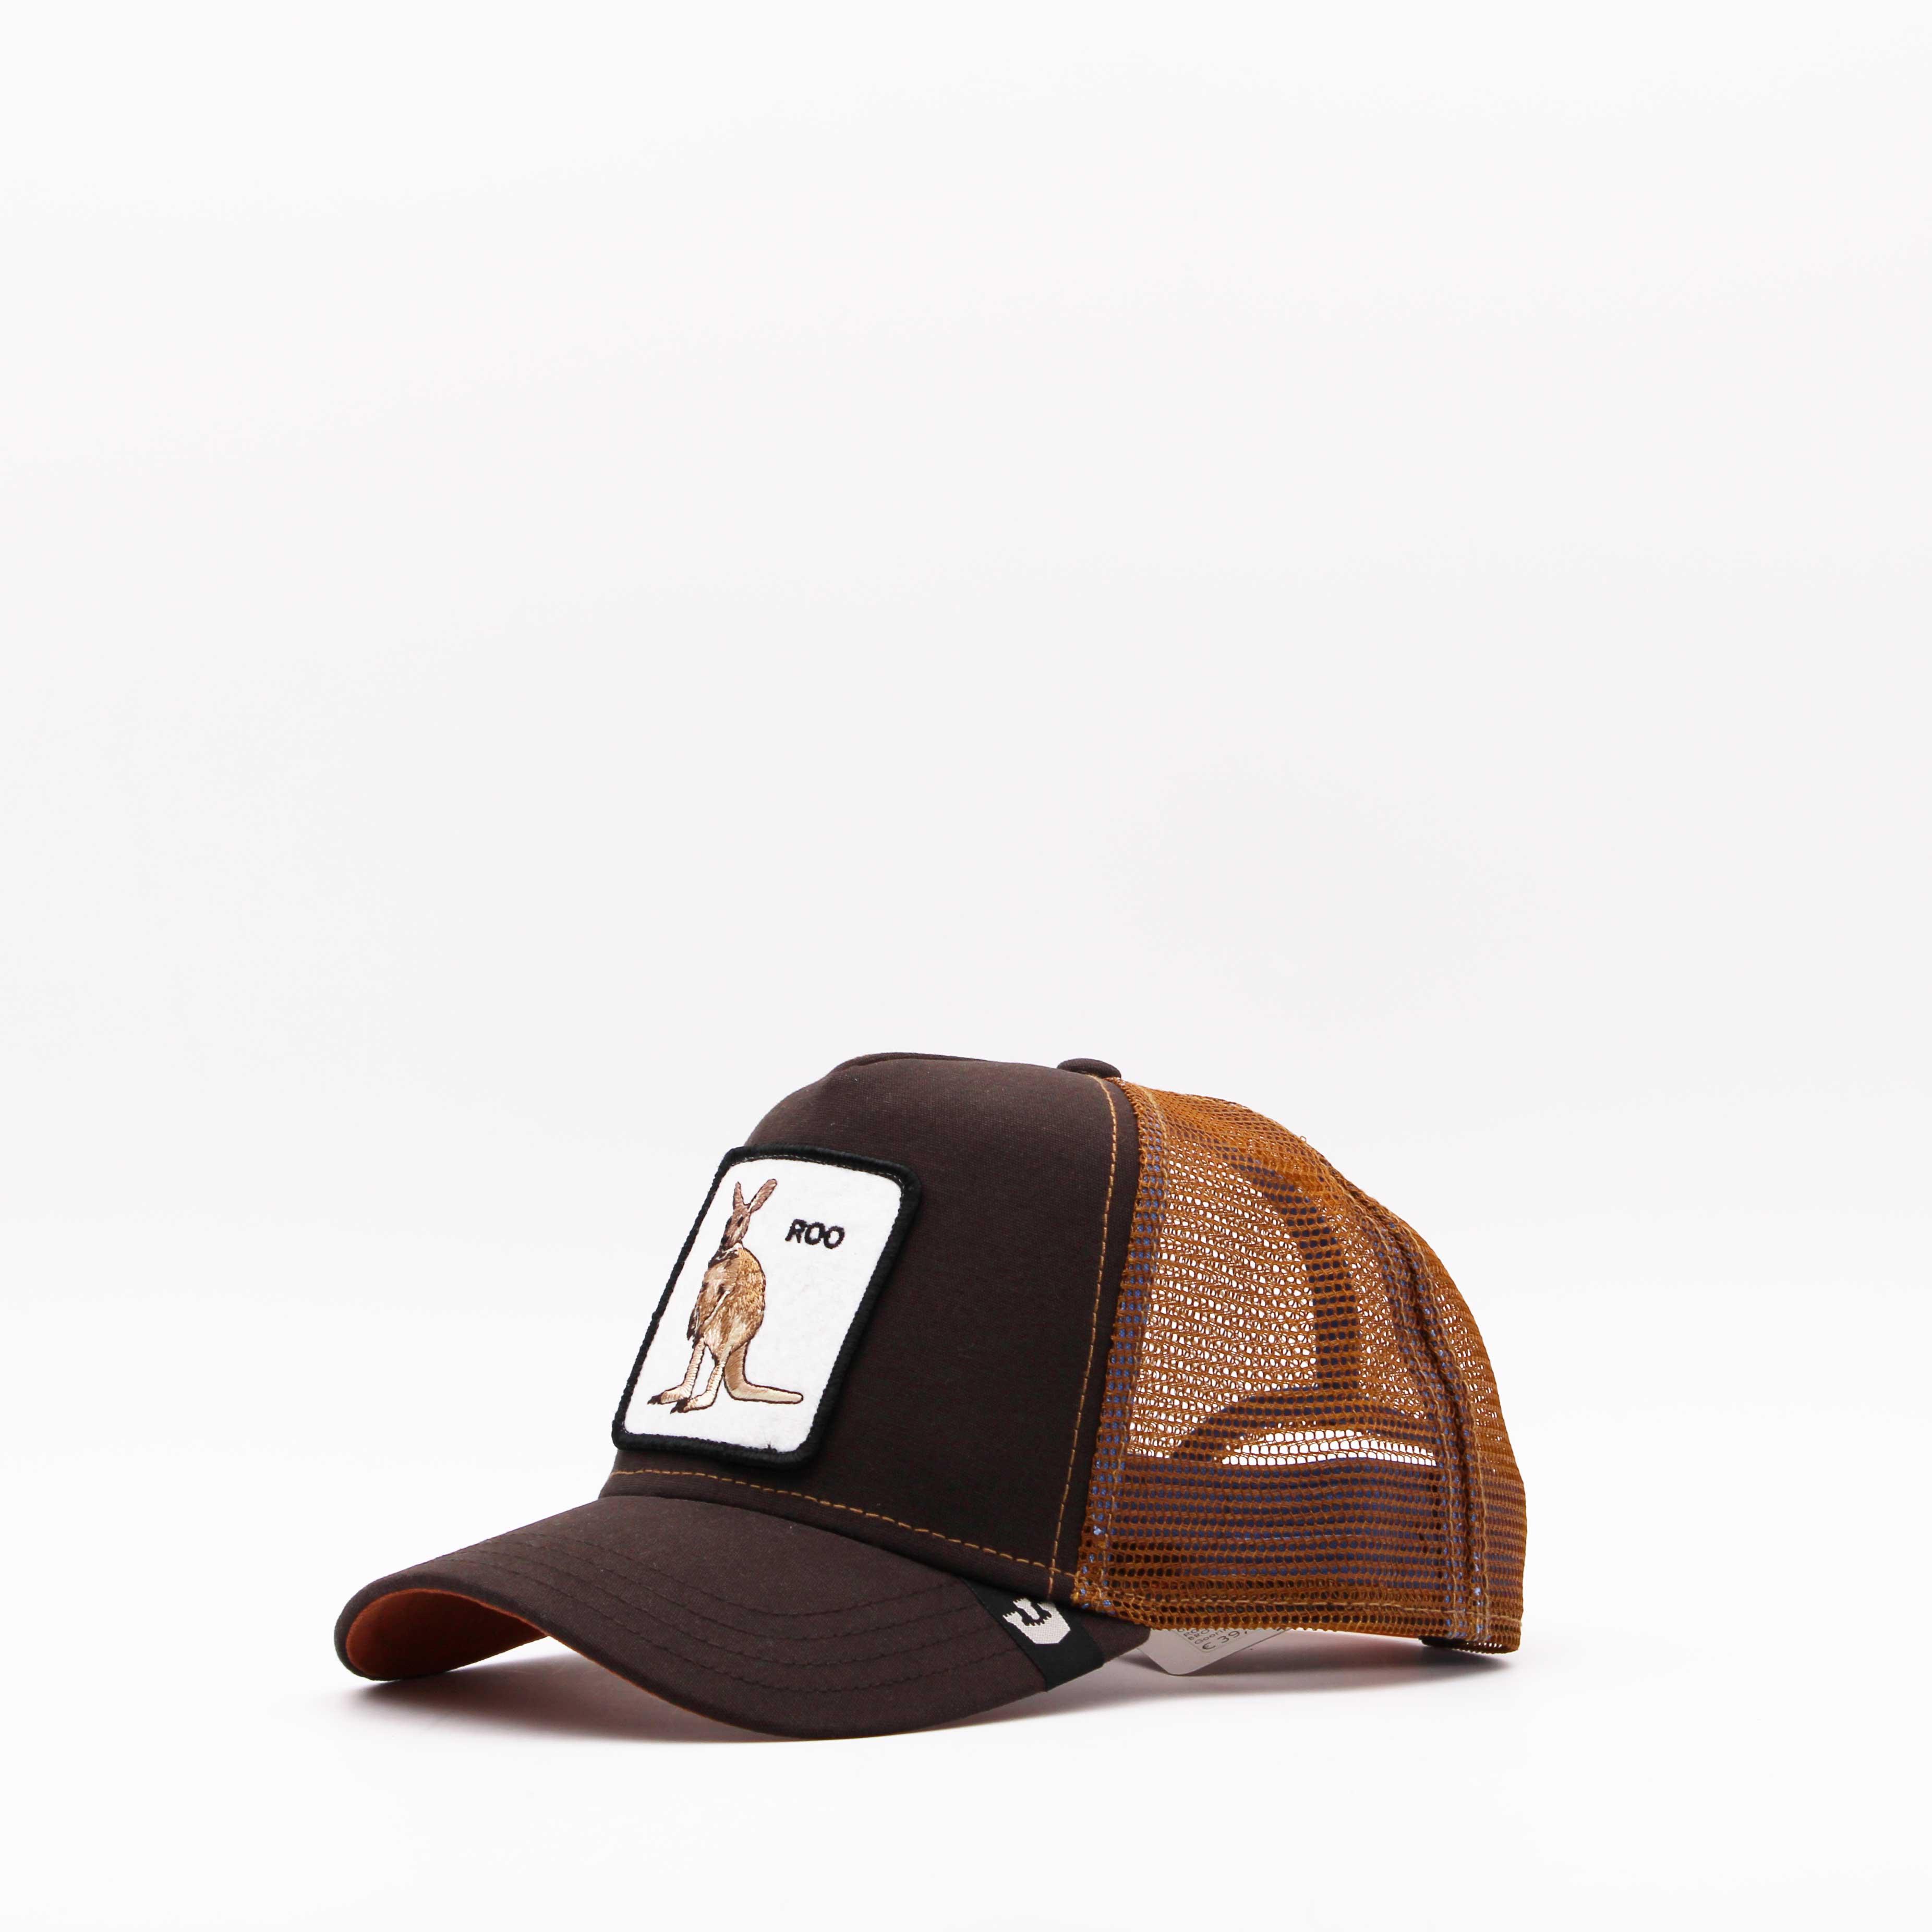 Cappello baseball roo - Marrone